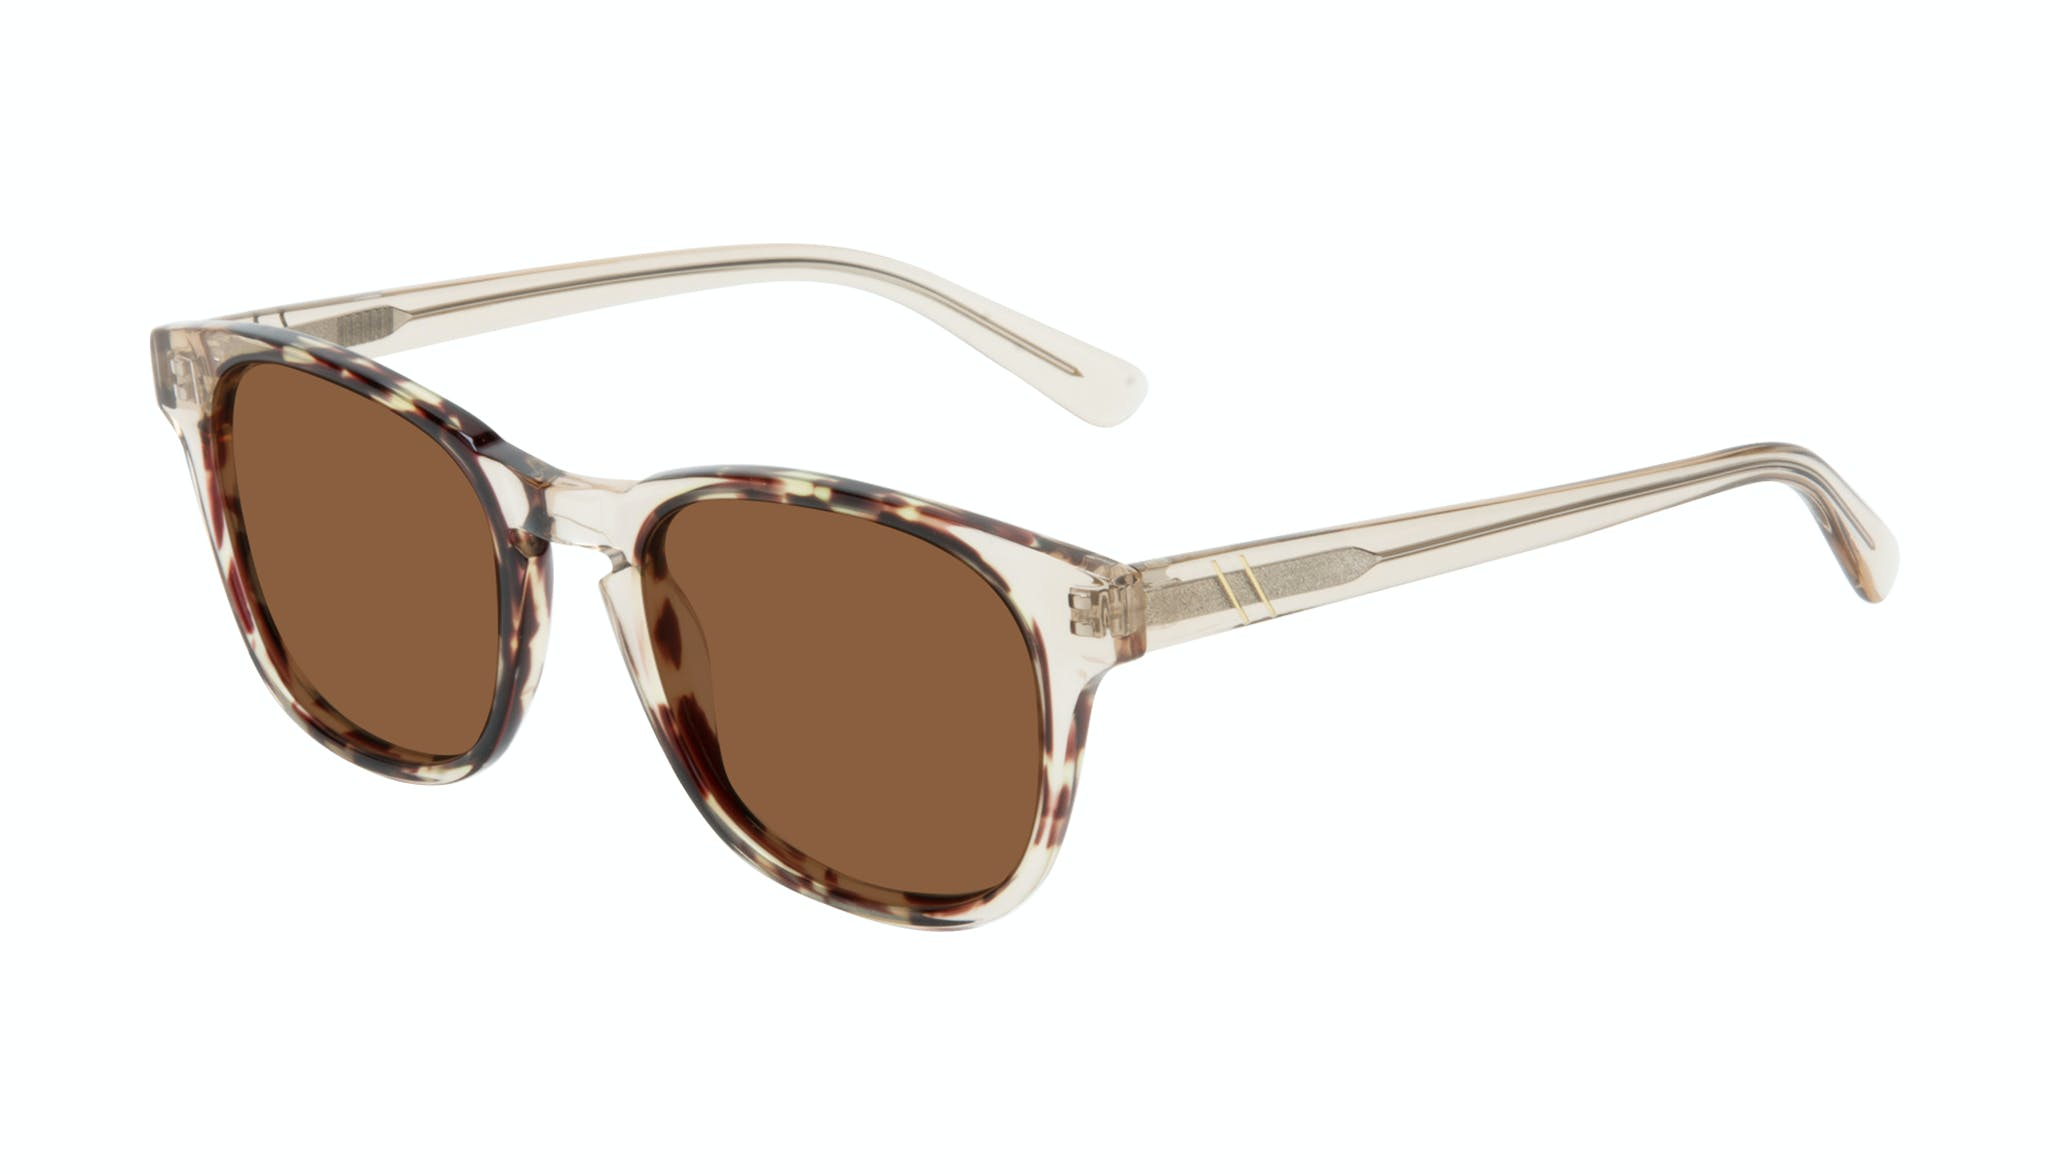 Affordable Fashion Glasses Square Sunglasses Men Outline Golden Tort Tilt